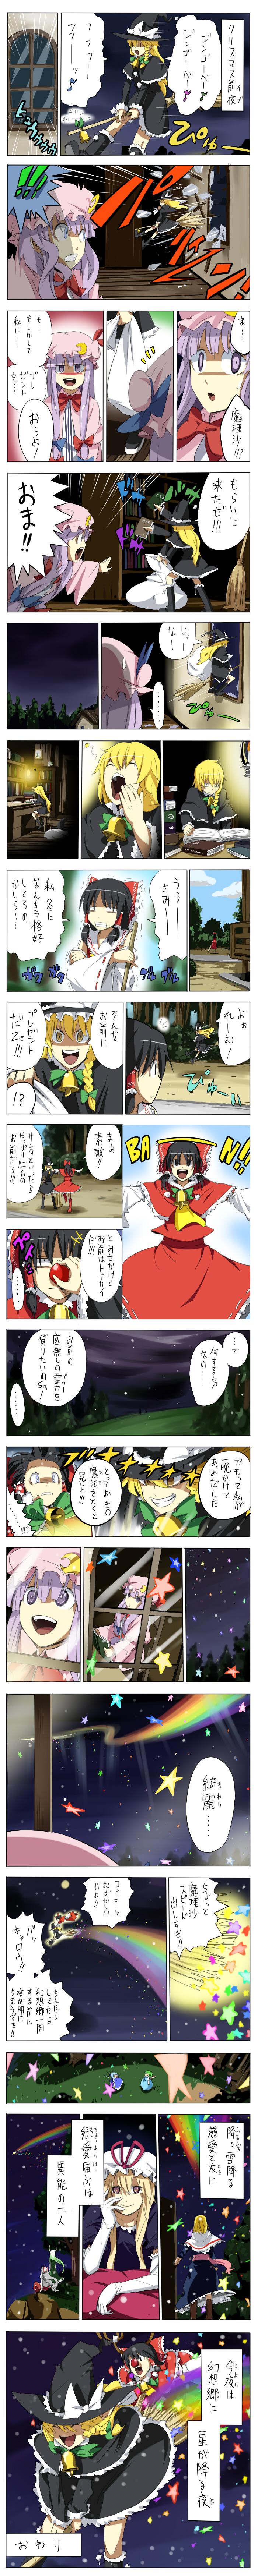 alice margatroid, cirno, daiyousei, ex-keine, fujiwara no mokou, and others (touhou) drawn by pageratta